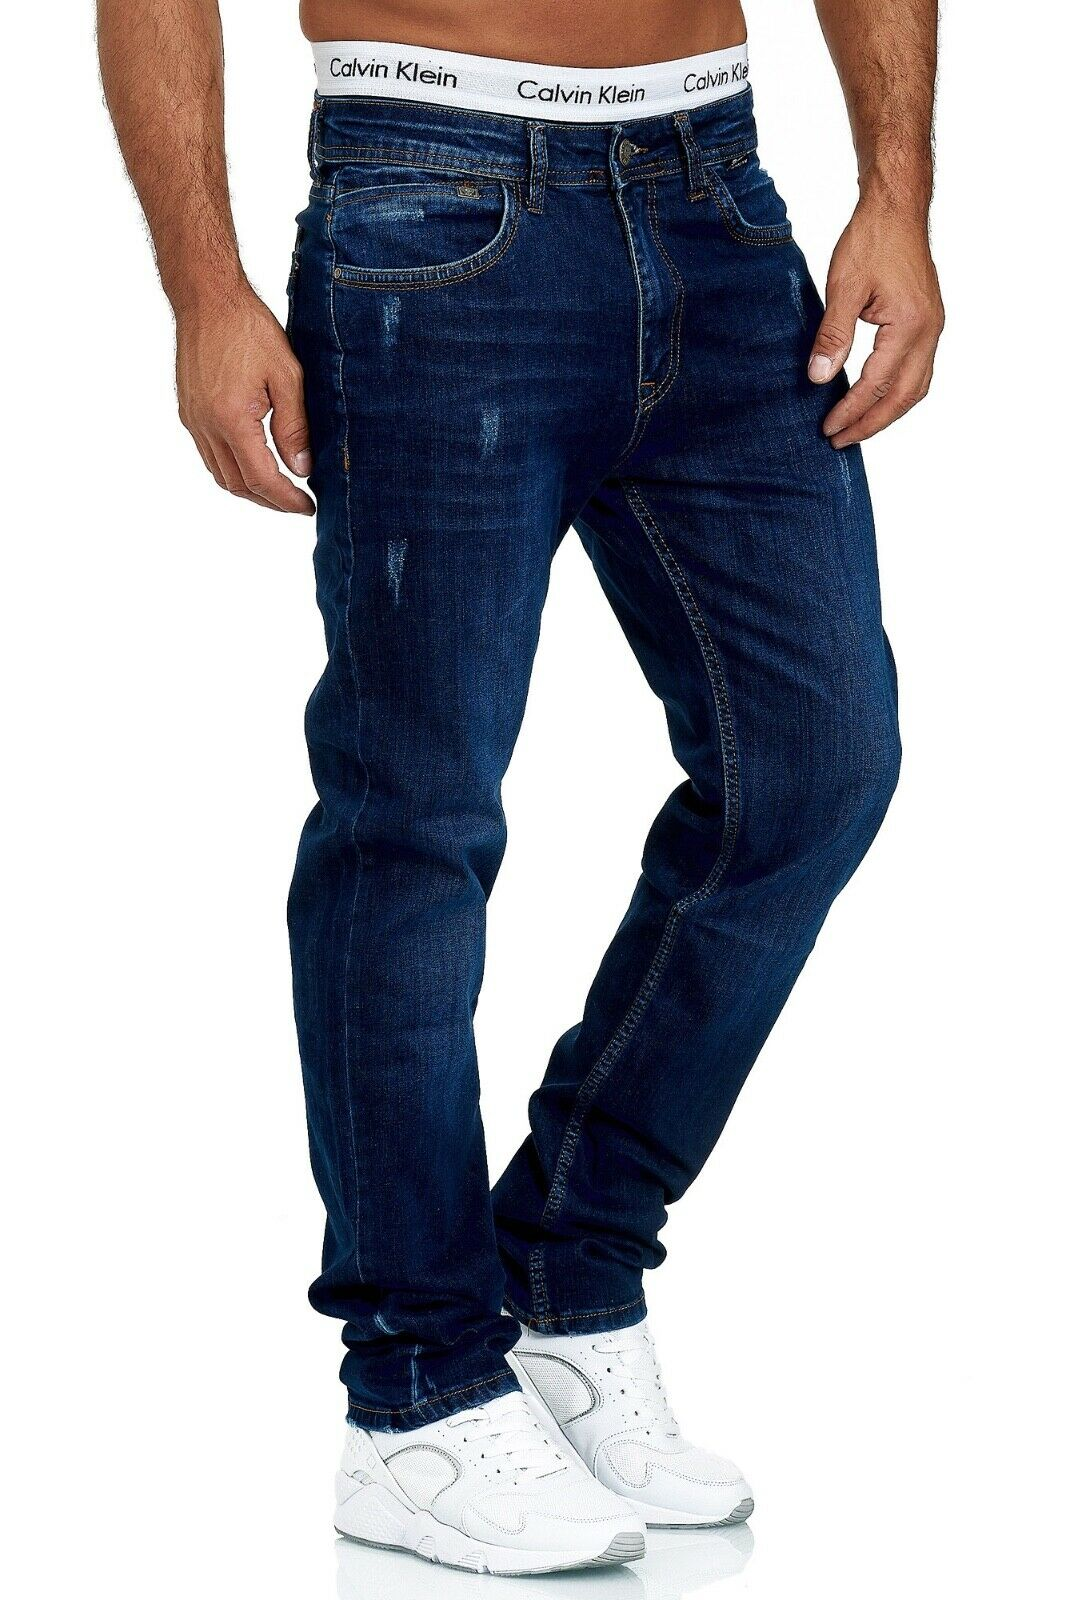 Herren-Jeans-Hose-Denim-KC-Black-Washed-Straight-Cut-Regular-Dicke-Naht-naehte Indexbild 68